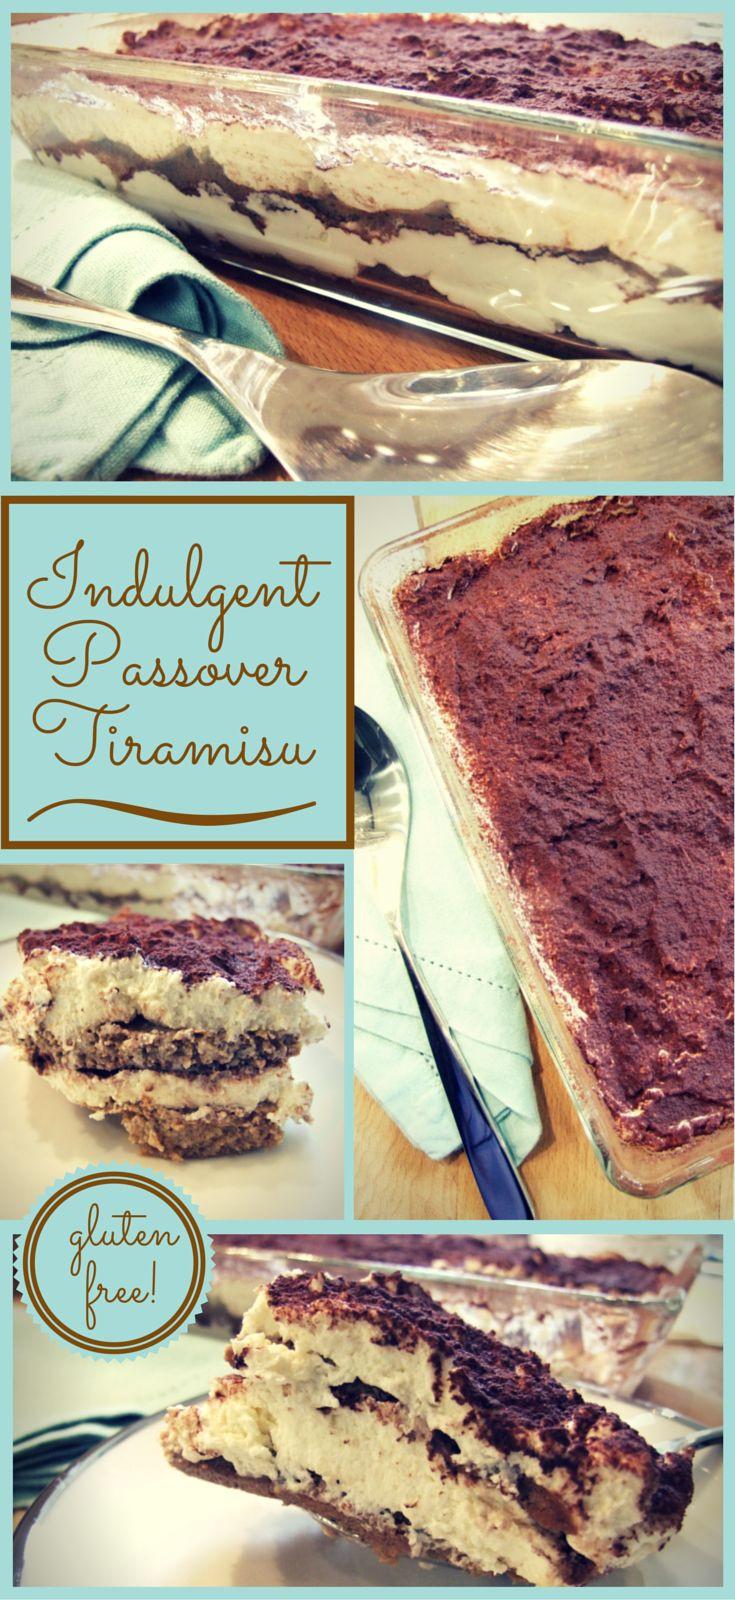 Easy Passover Desserts  Indulgent Pesach tiramisu gluten free passover dessert